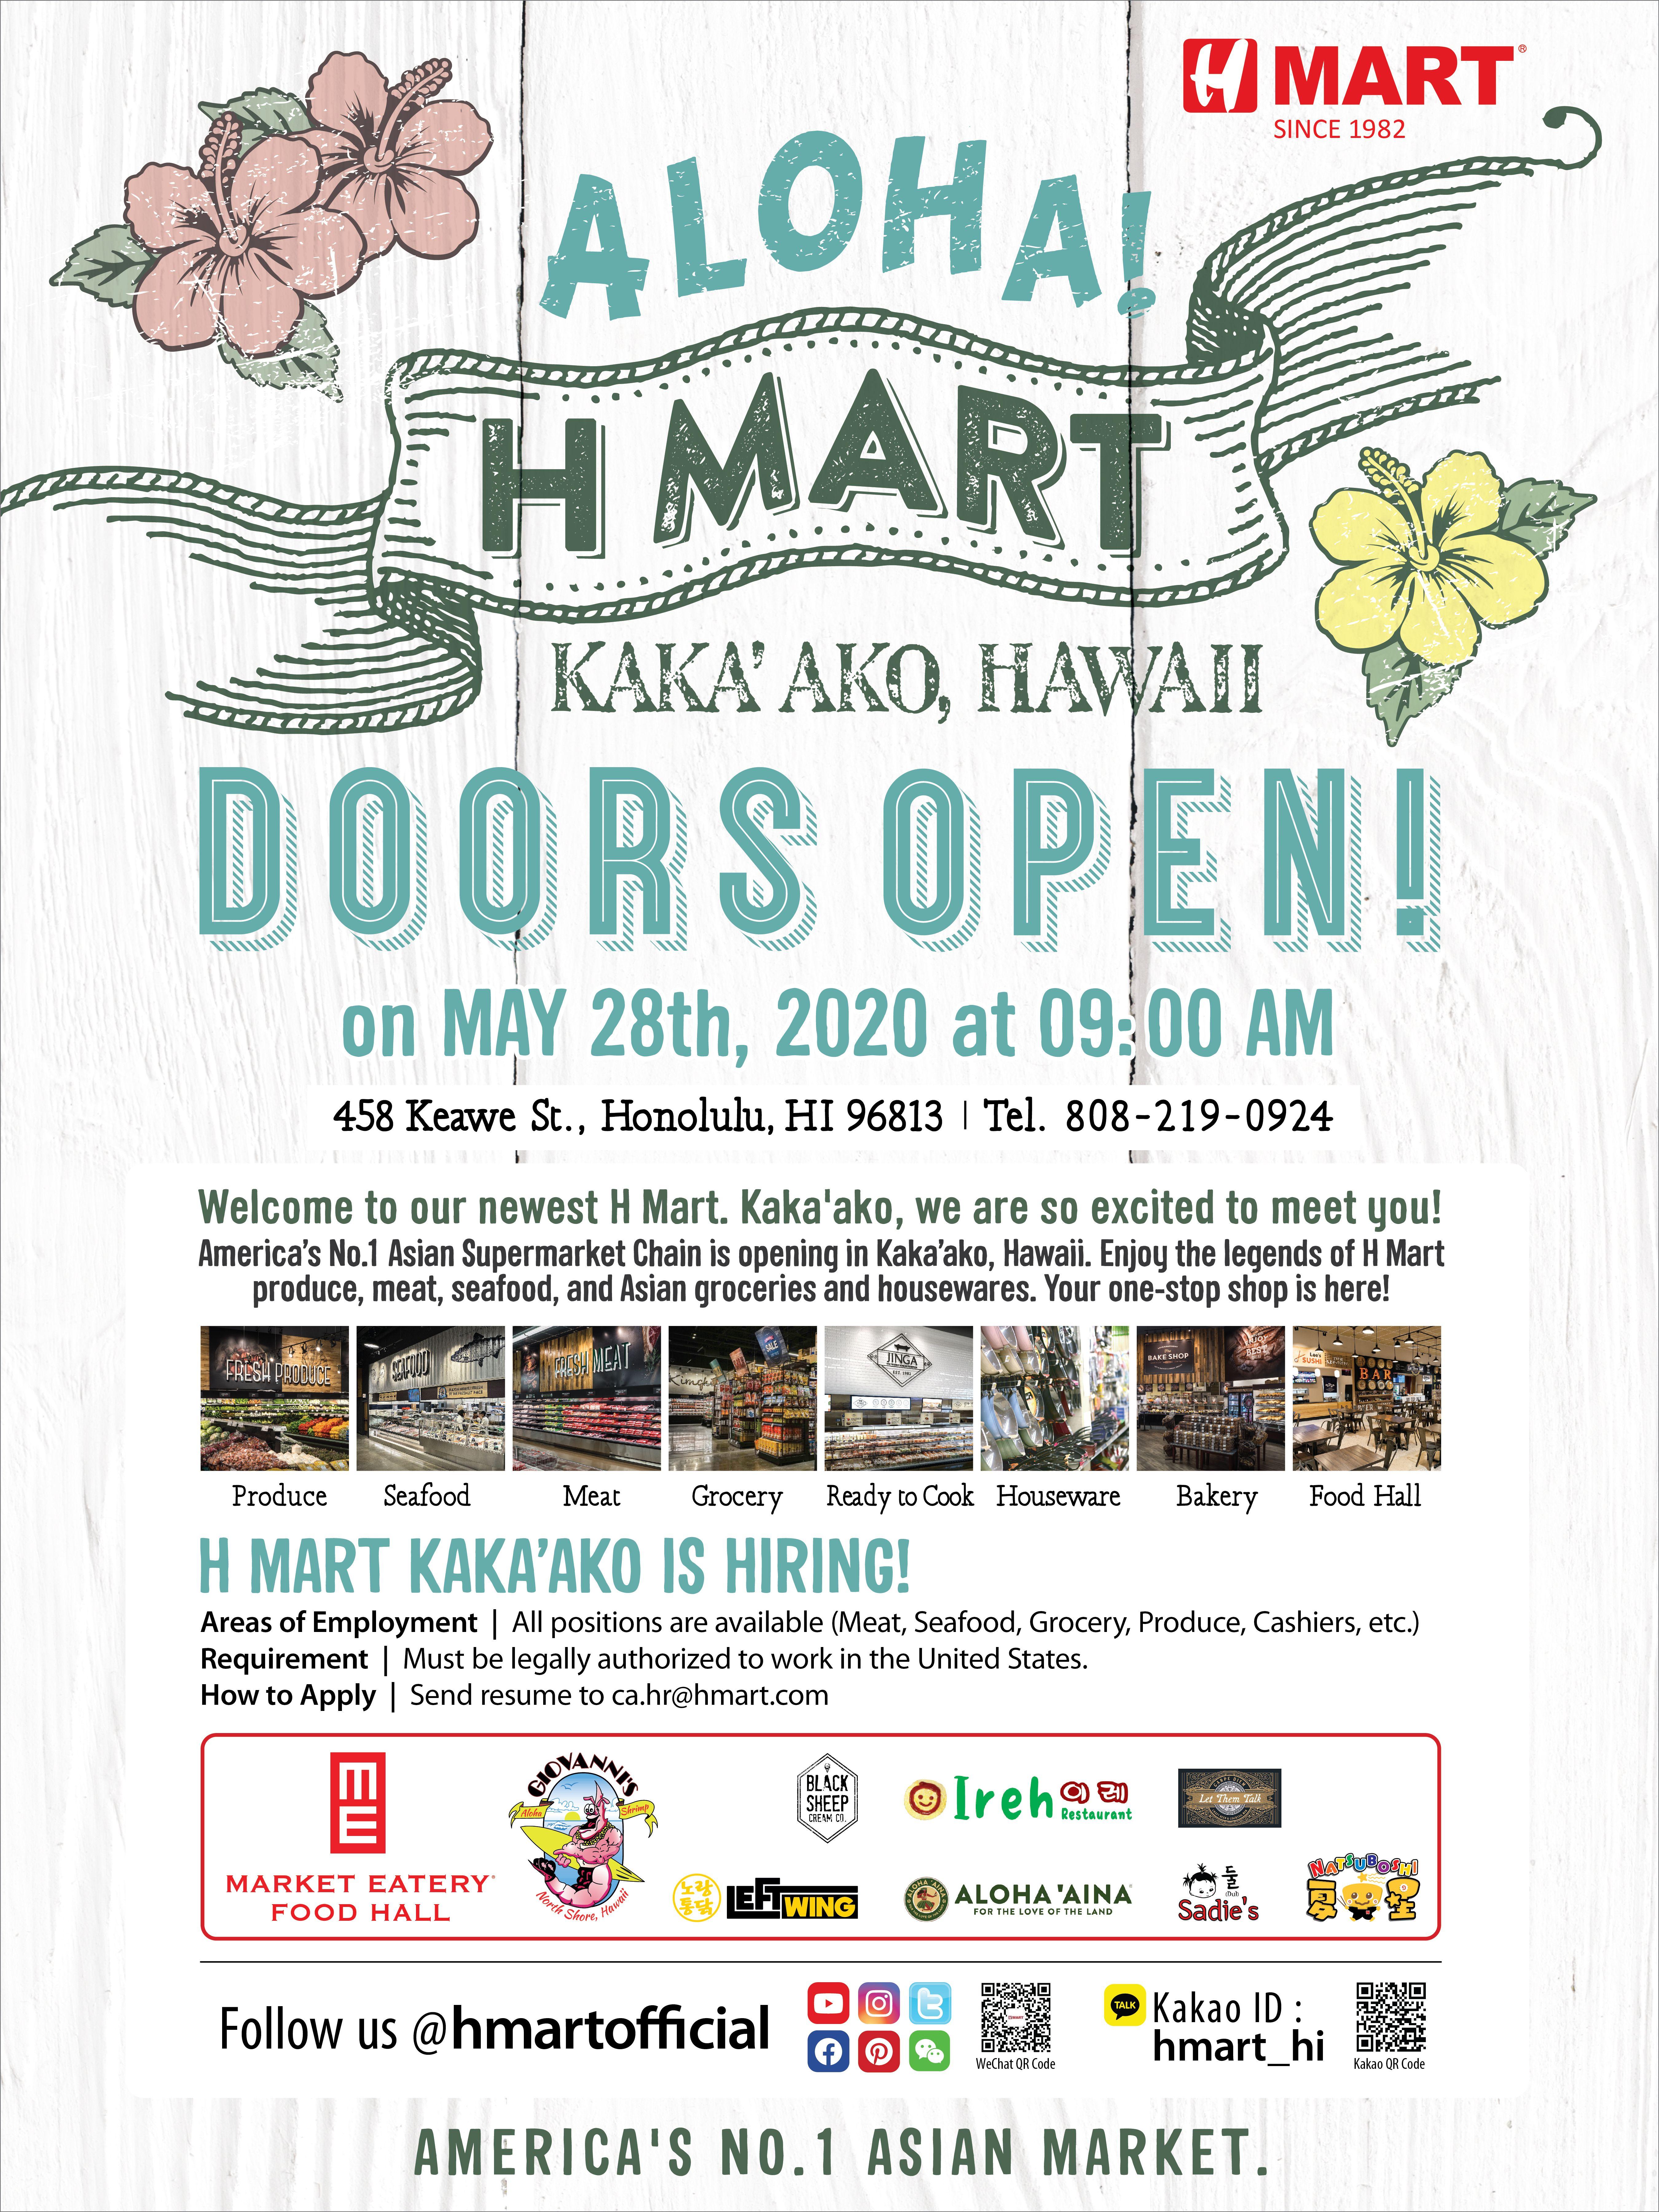 hwi_doors open_eng_poster_ 01